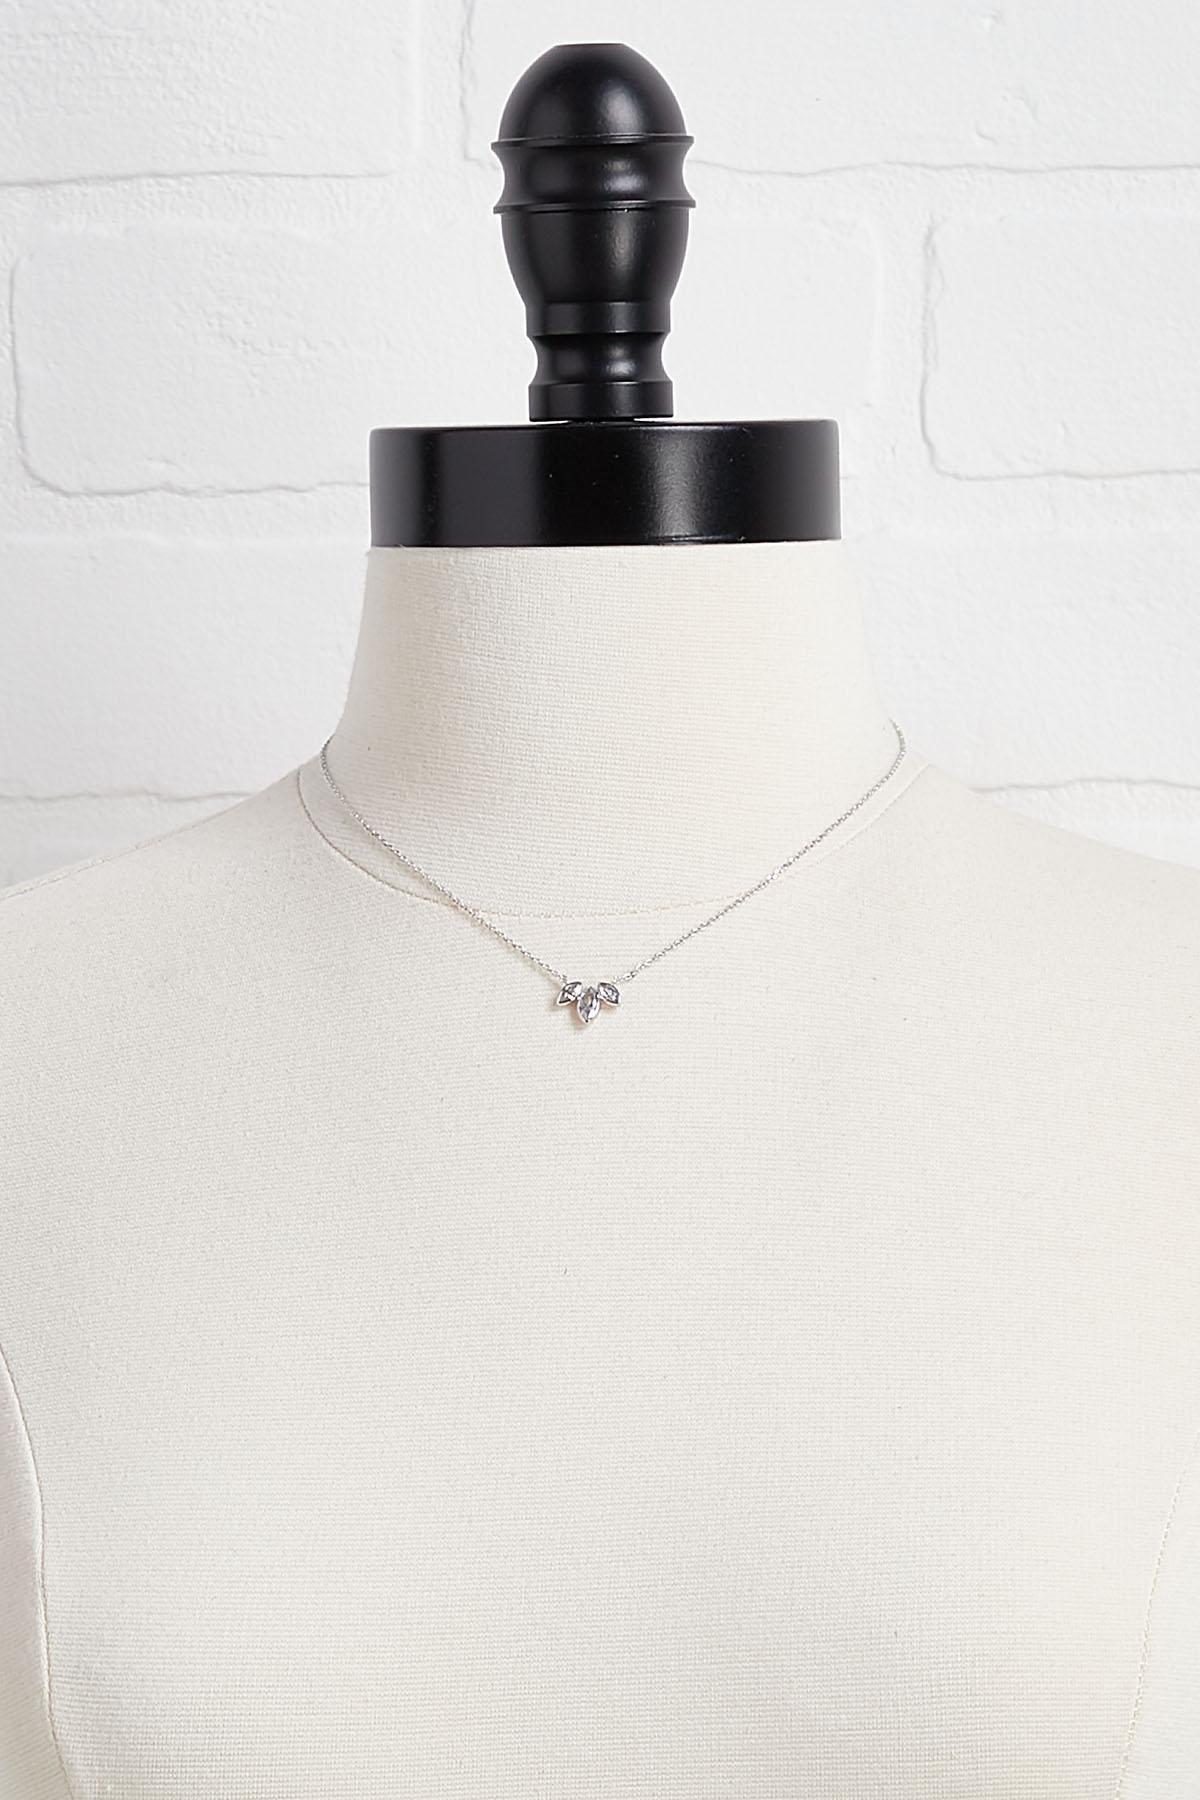 Cateye Pendant Necklace